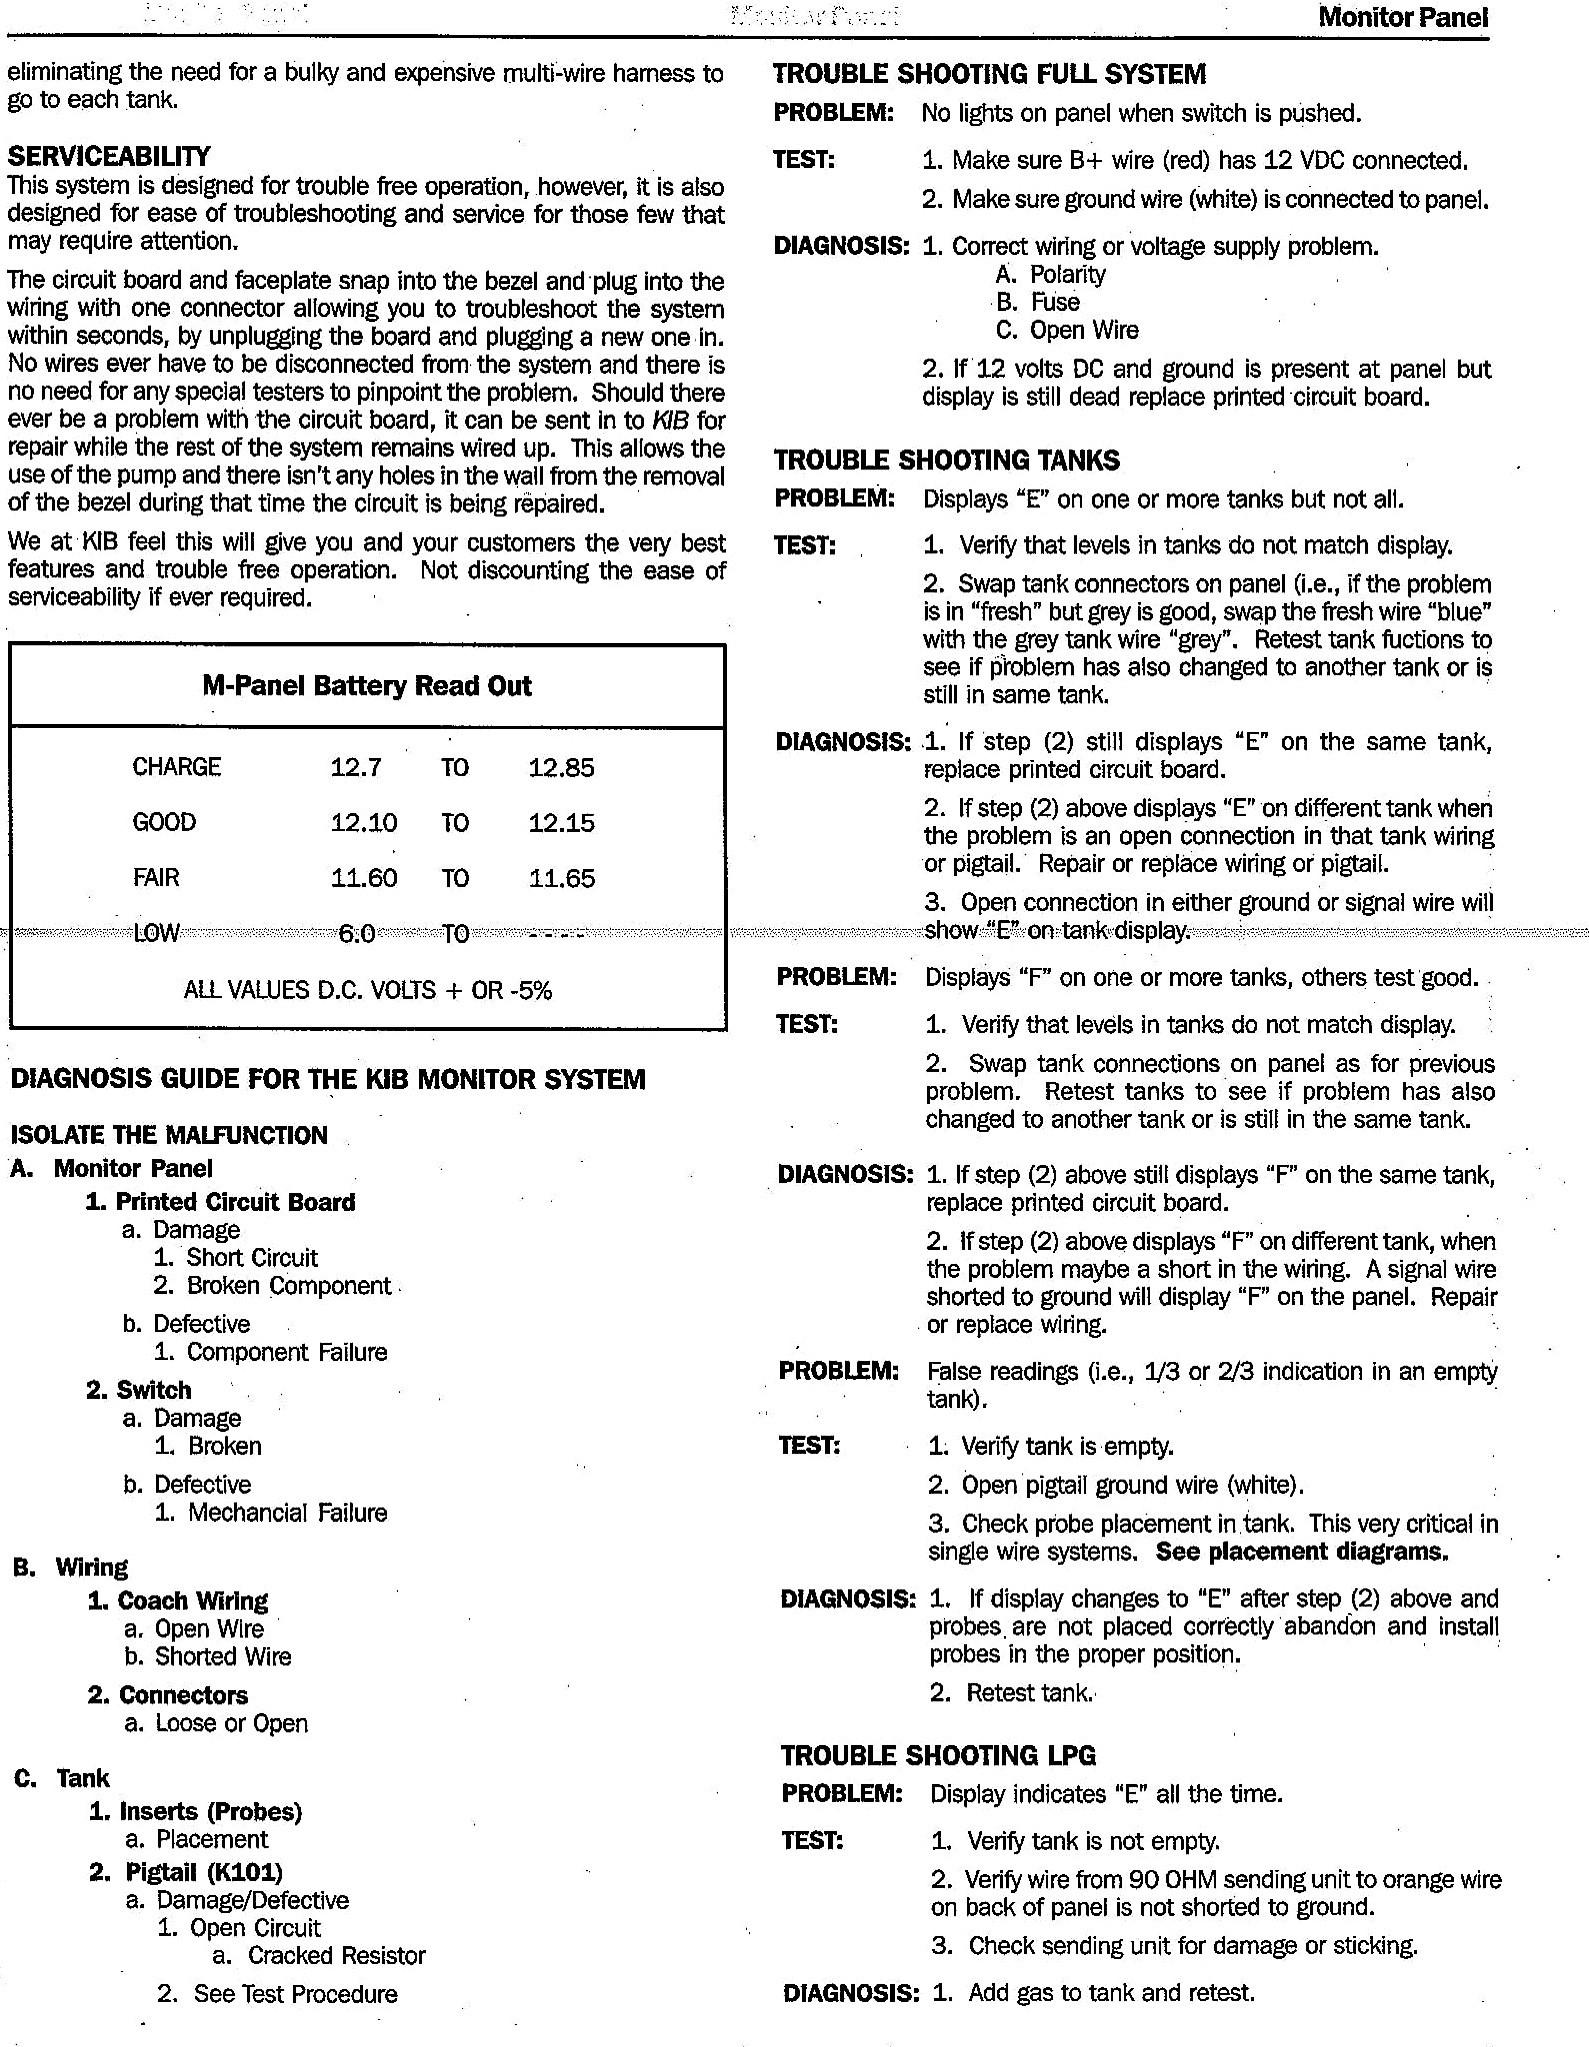 Kib Model M21vw Manual Pdf Ec 2705] Jrv Monitor Panel Wiring Diagram Schematic Wiring Of Kib Model M21vw Manual Pdf